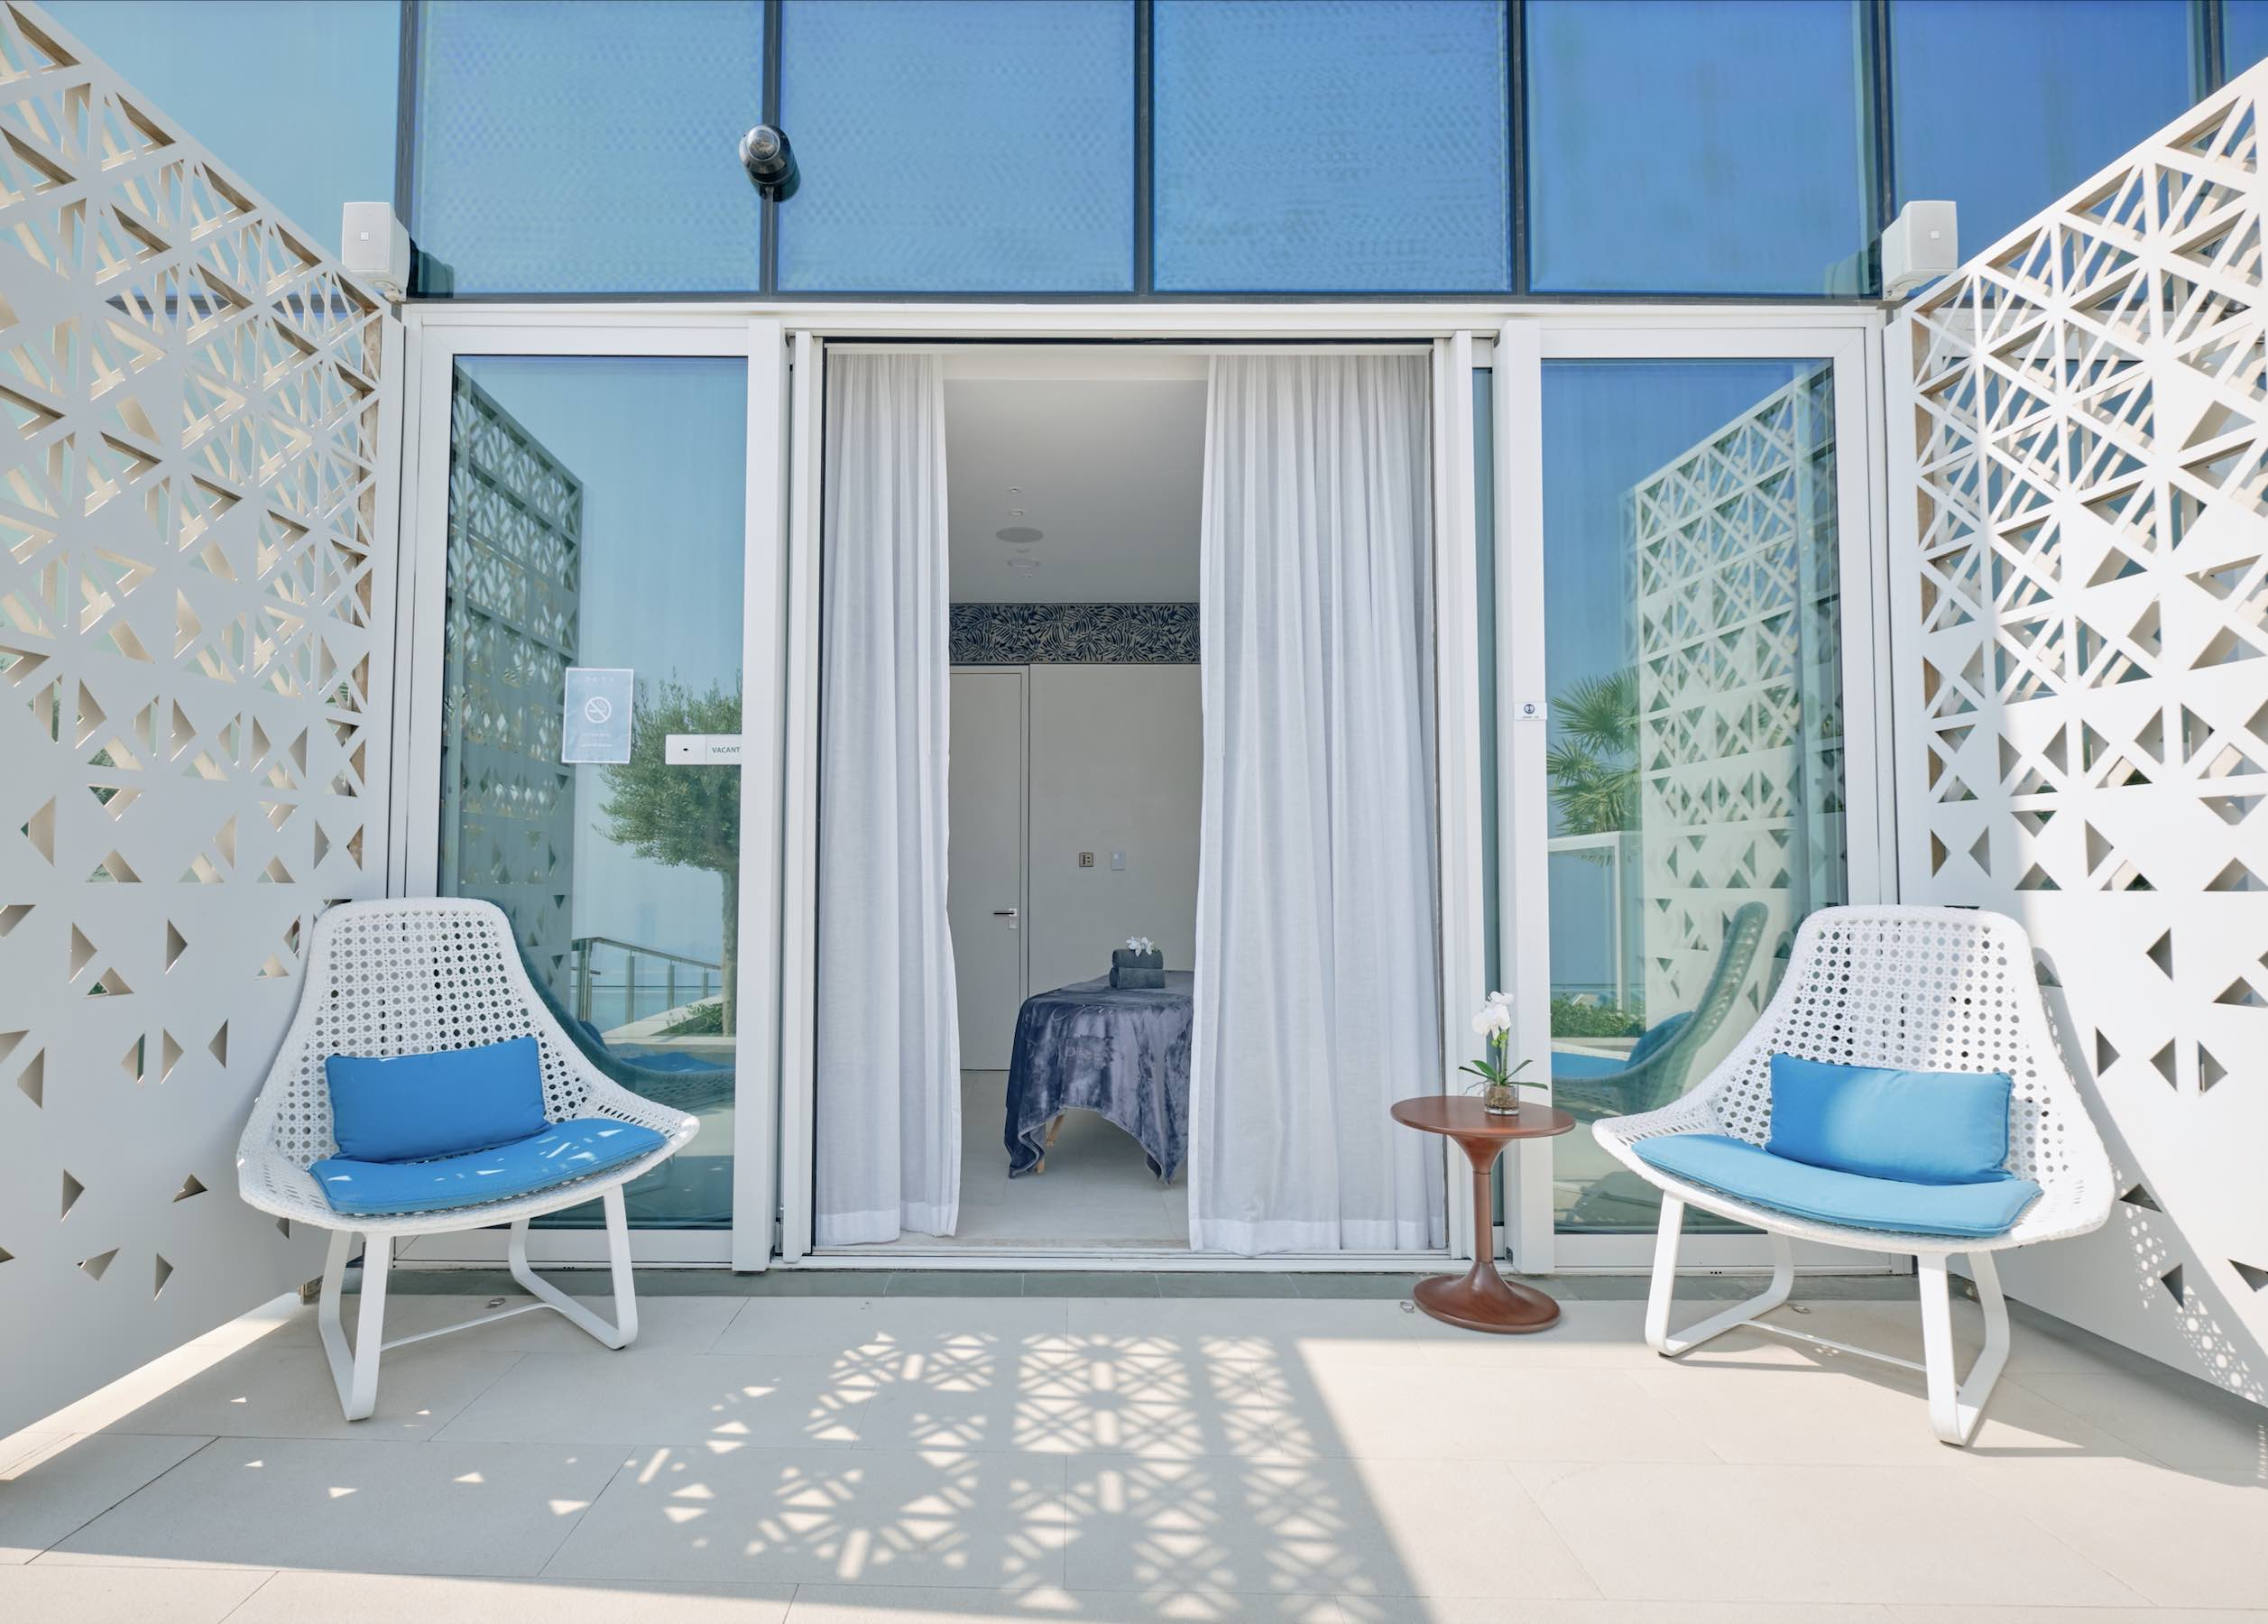 The Spa Address Beach Resort